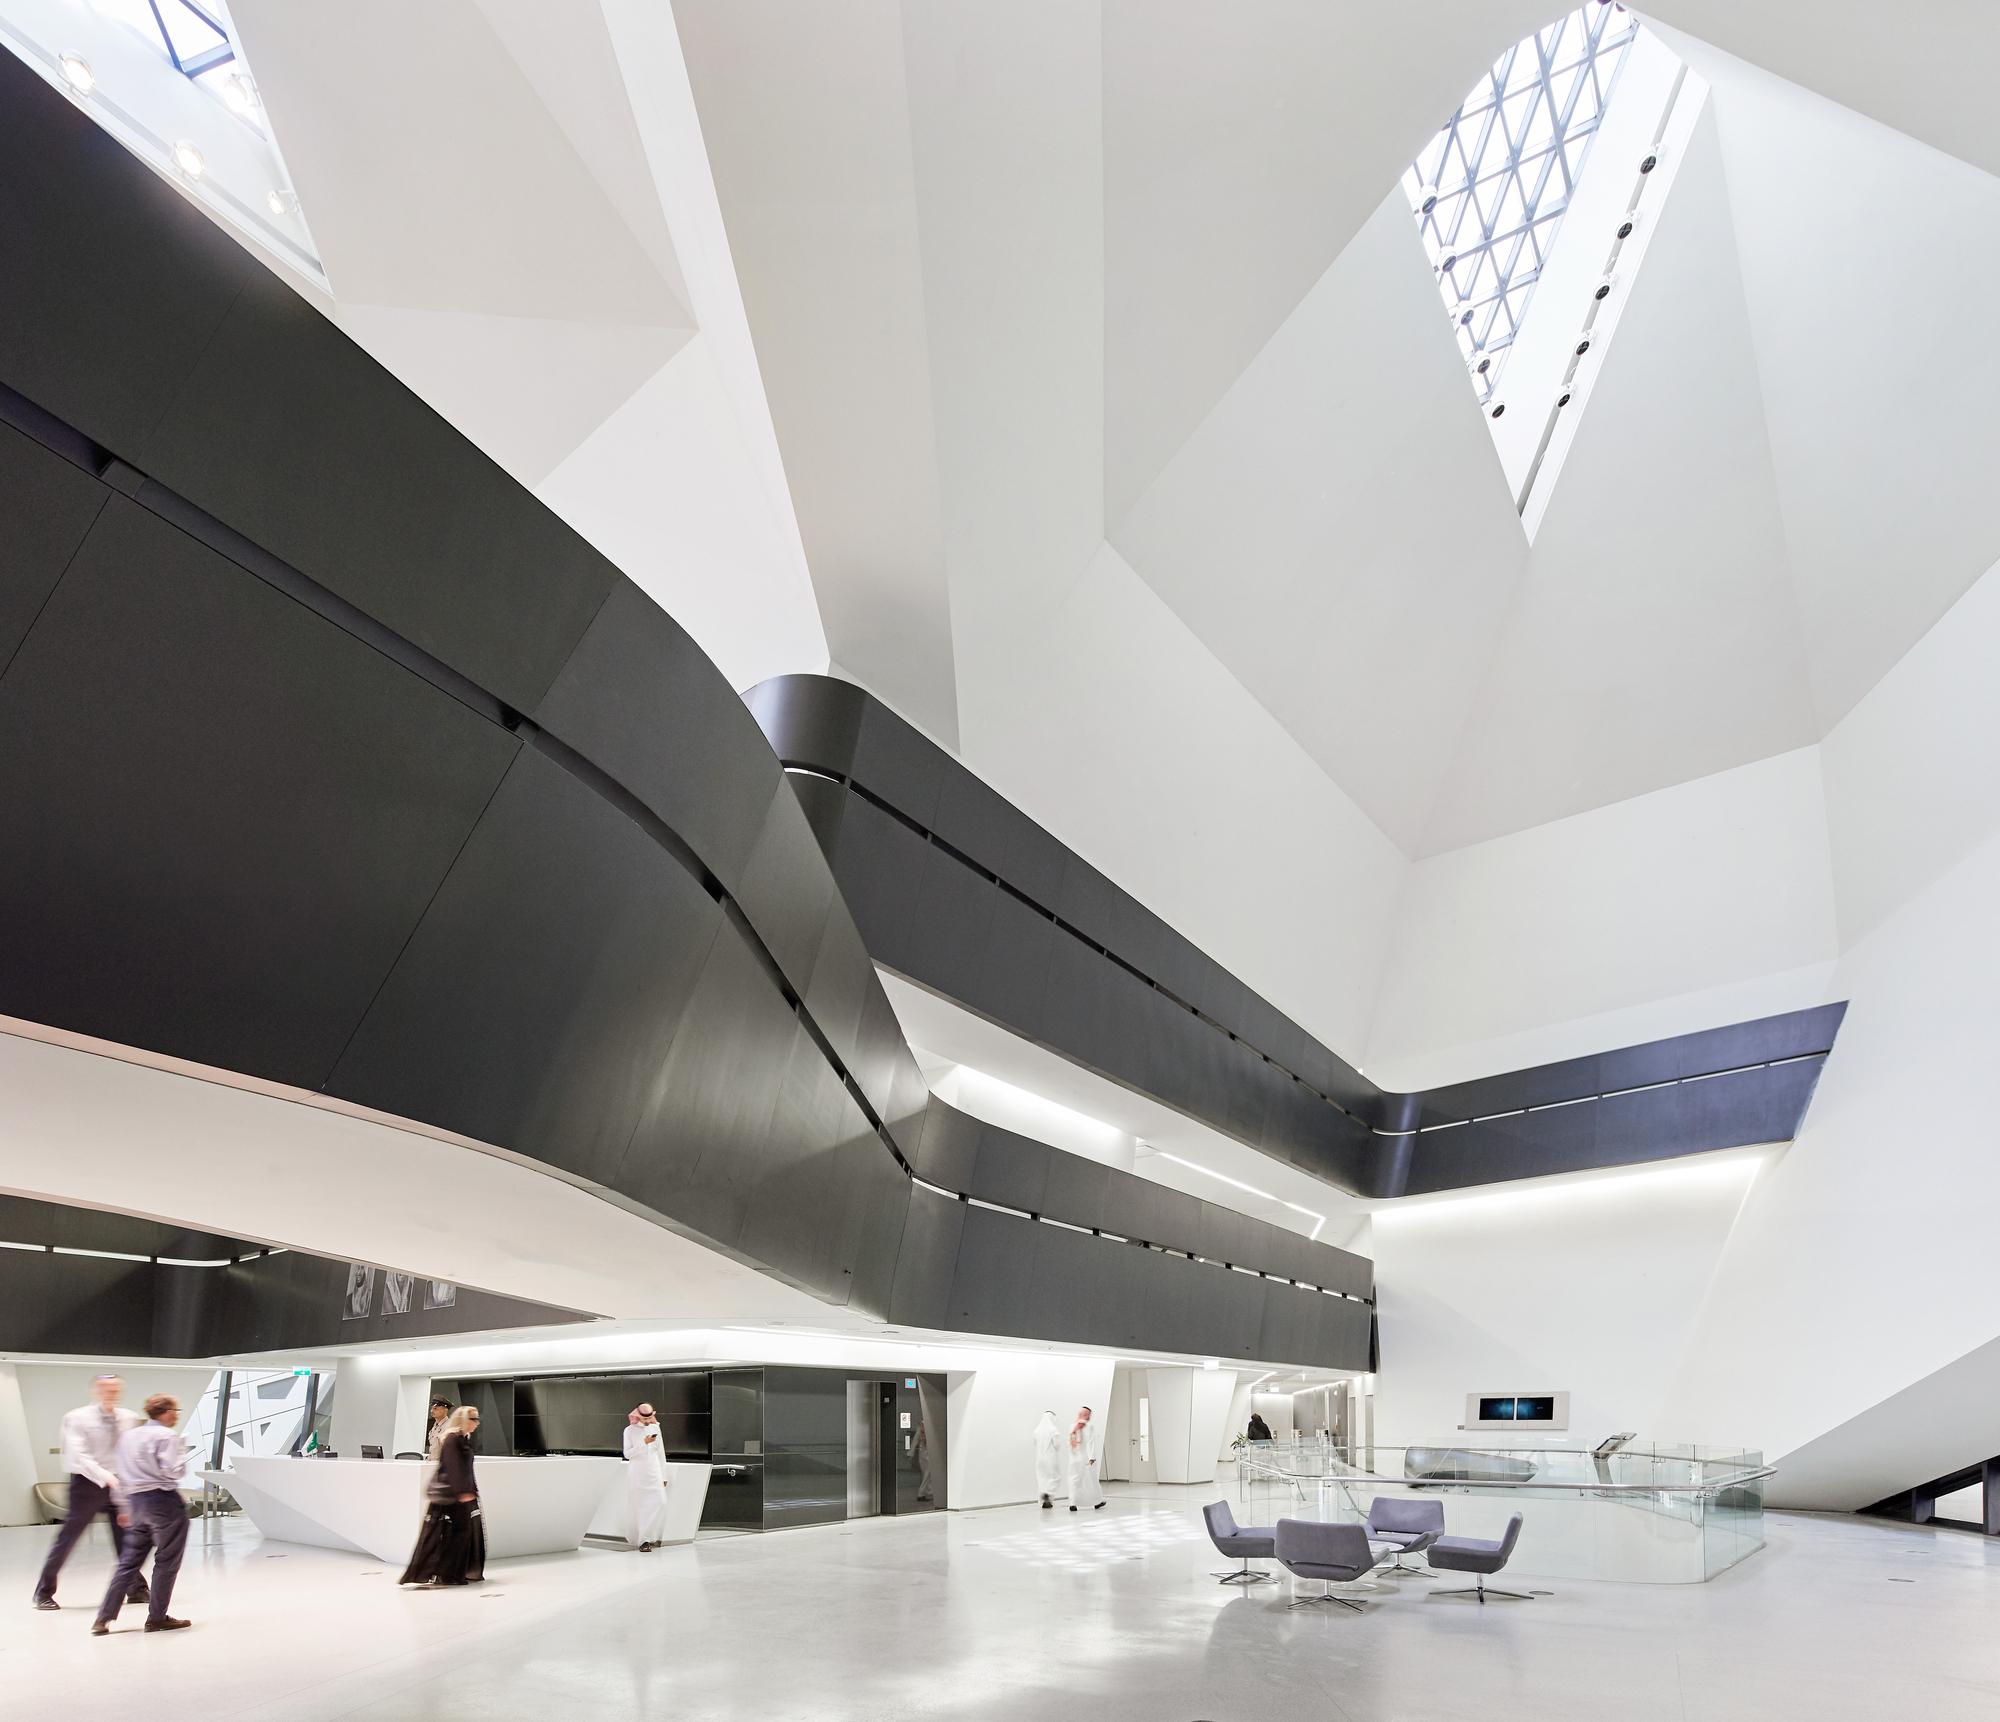 Resultado de imagem para Centro de Estudos e Pesquisas de Petróleo Rei Abdullah / Zaha Hadid Architects